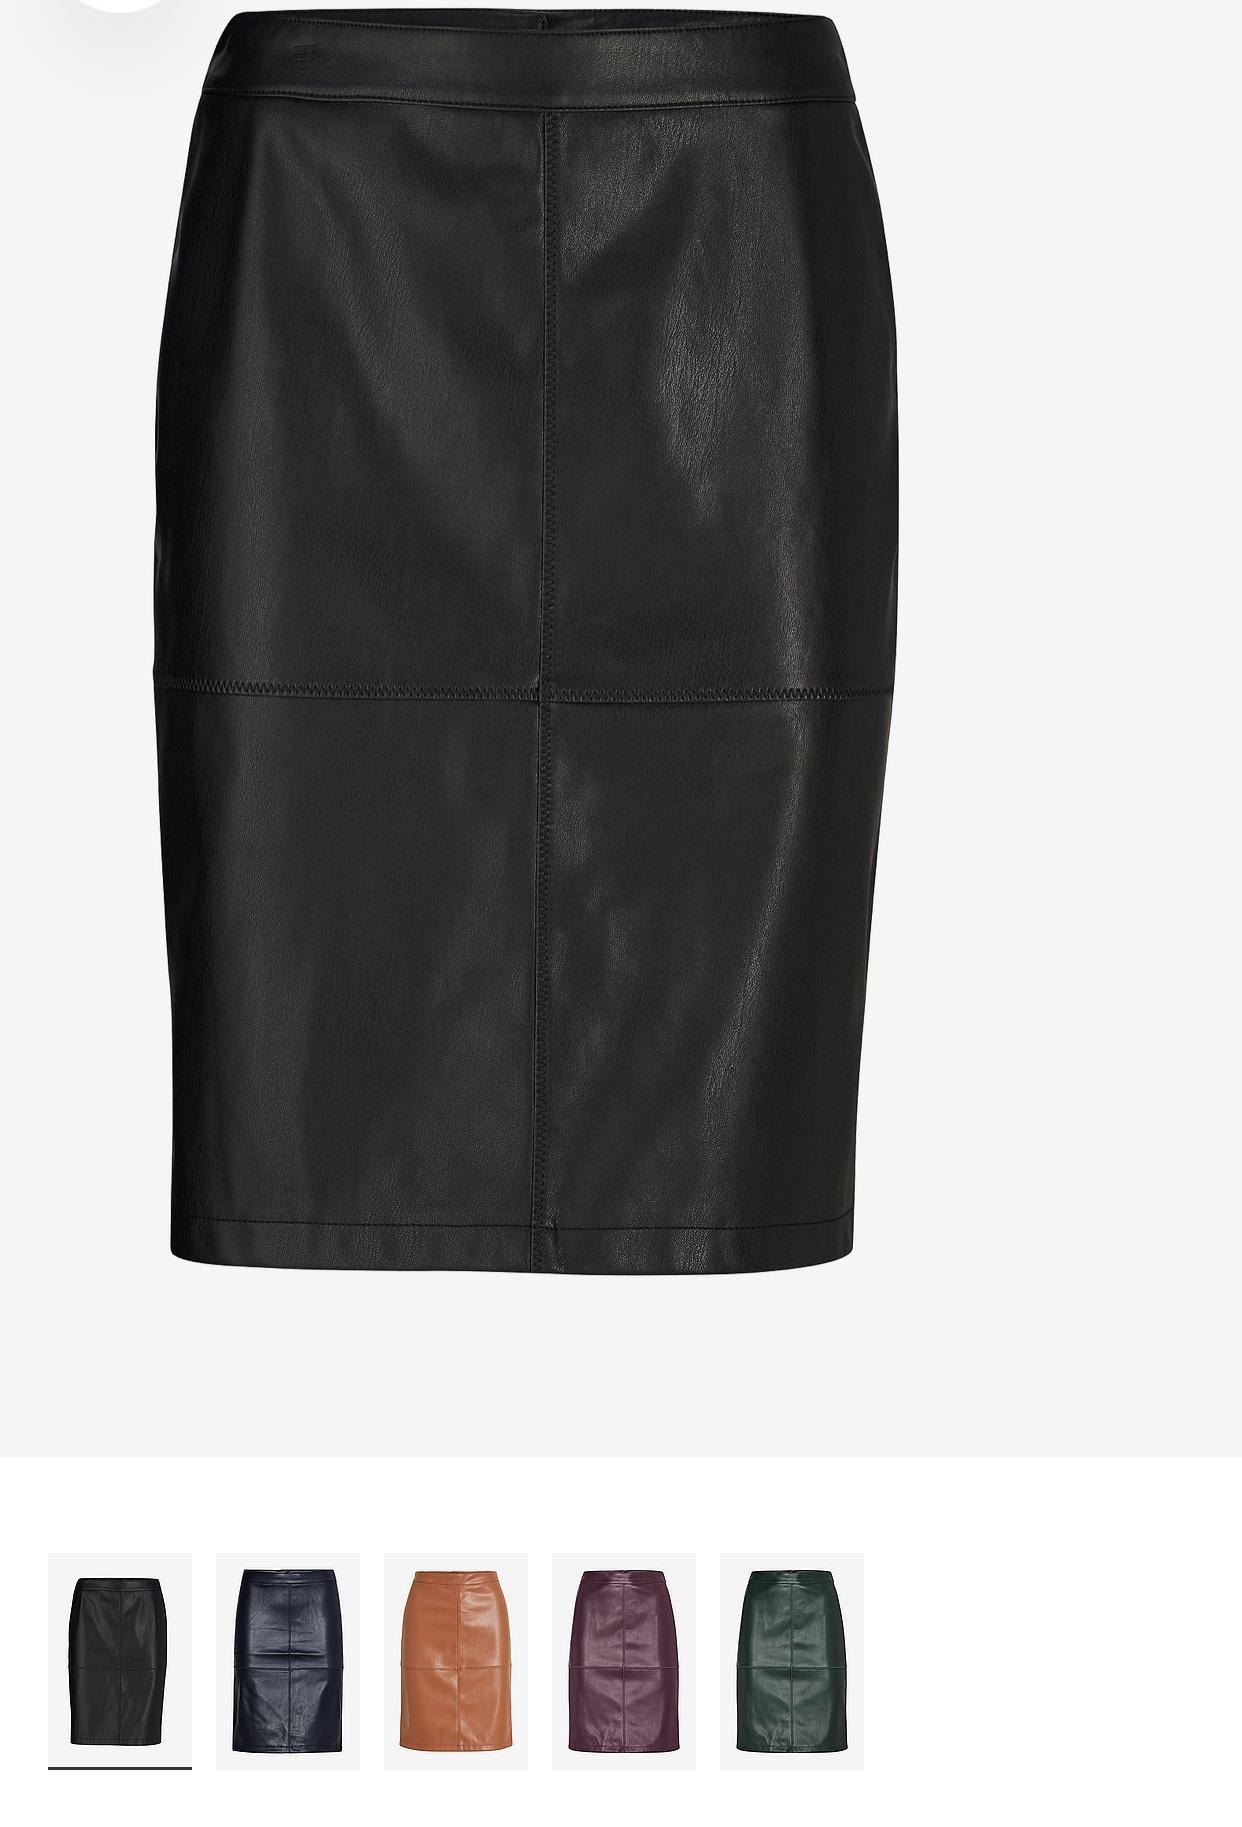 Styla kjol i läderimitation 